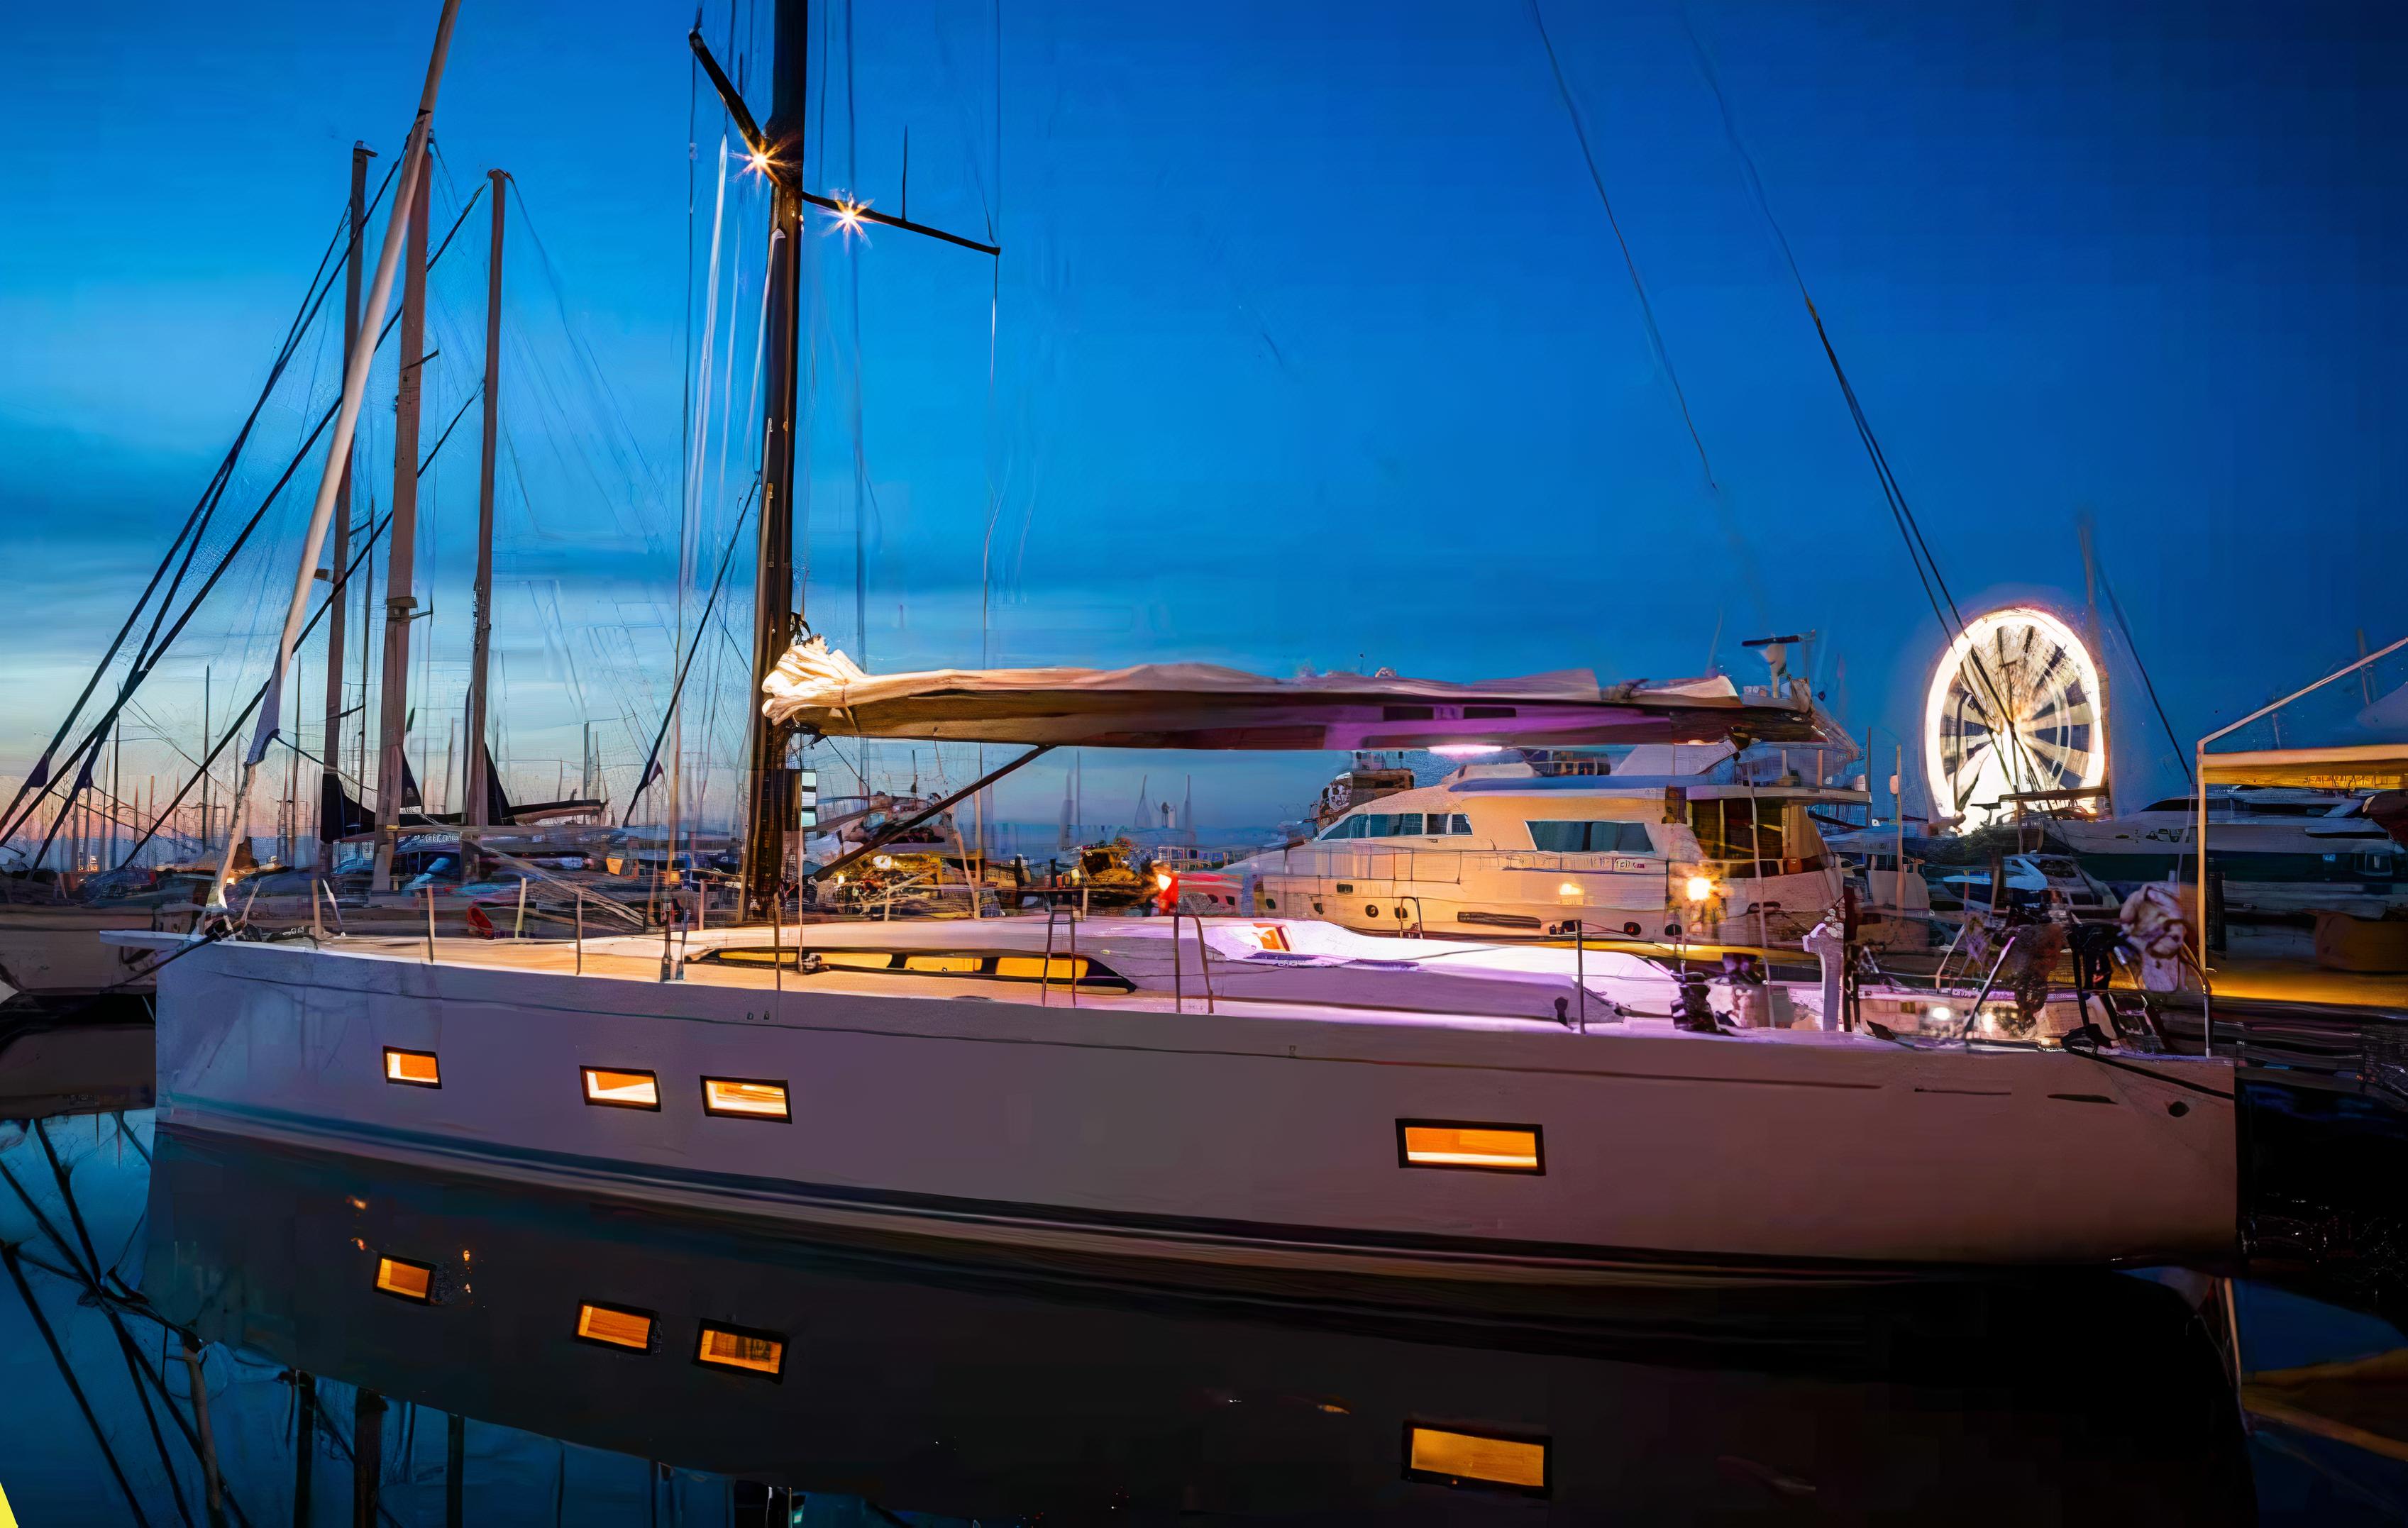 Sailboat with Navigation Lights © Axxon, via Mantagua